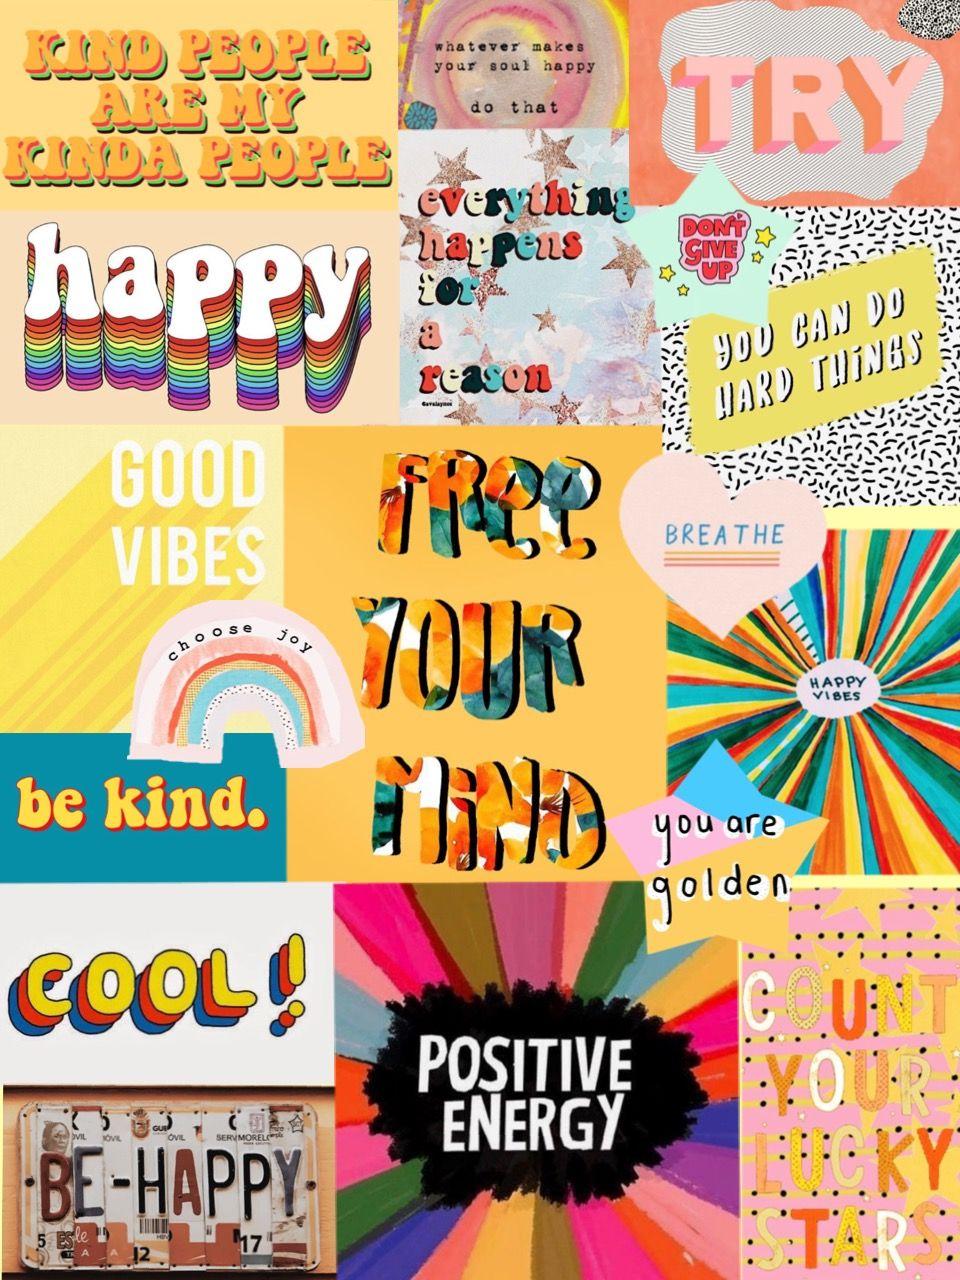 Inspo Happy Collage Positivity Iphone Wallpaper Vsco Artsy